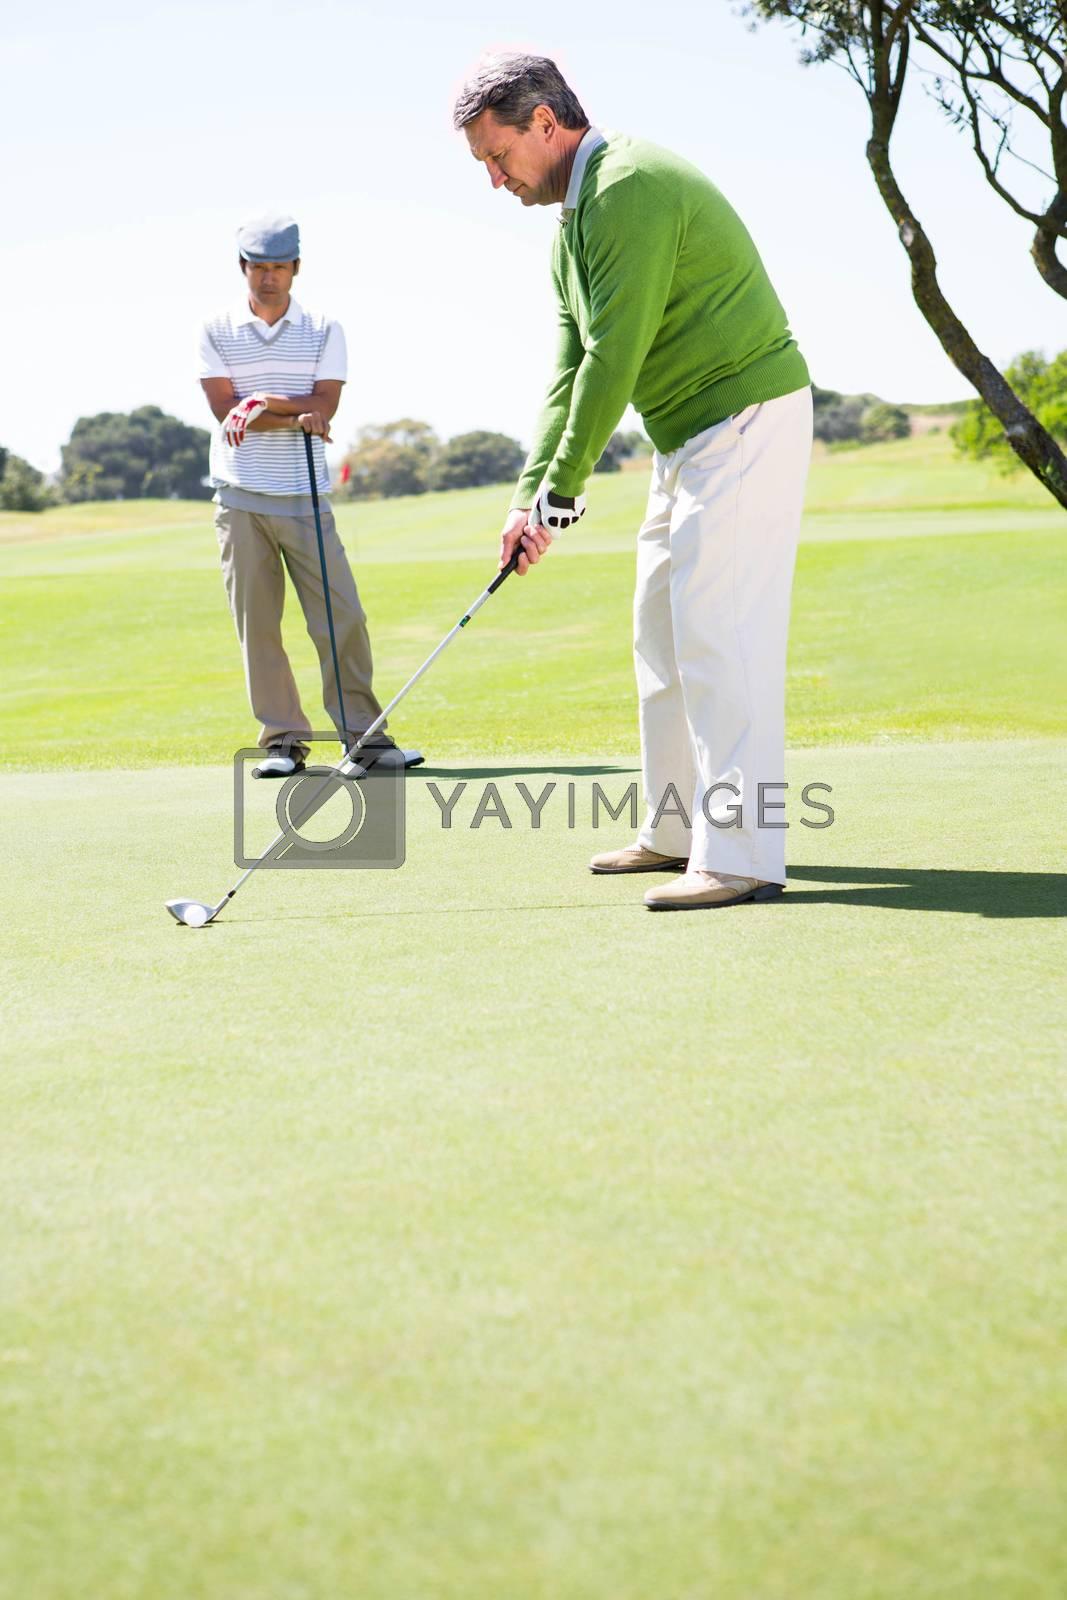 Golfing friends teeing off  by Wavebreakmedia